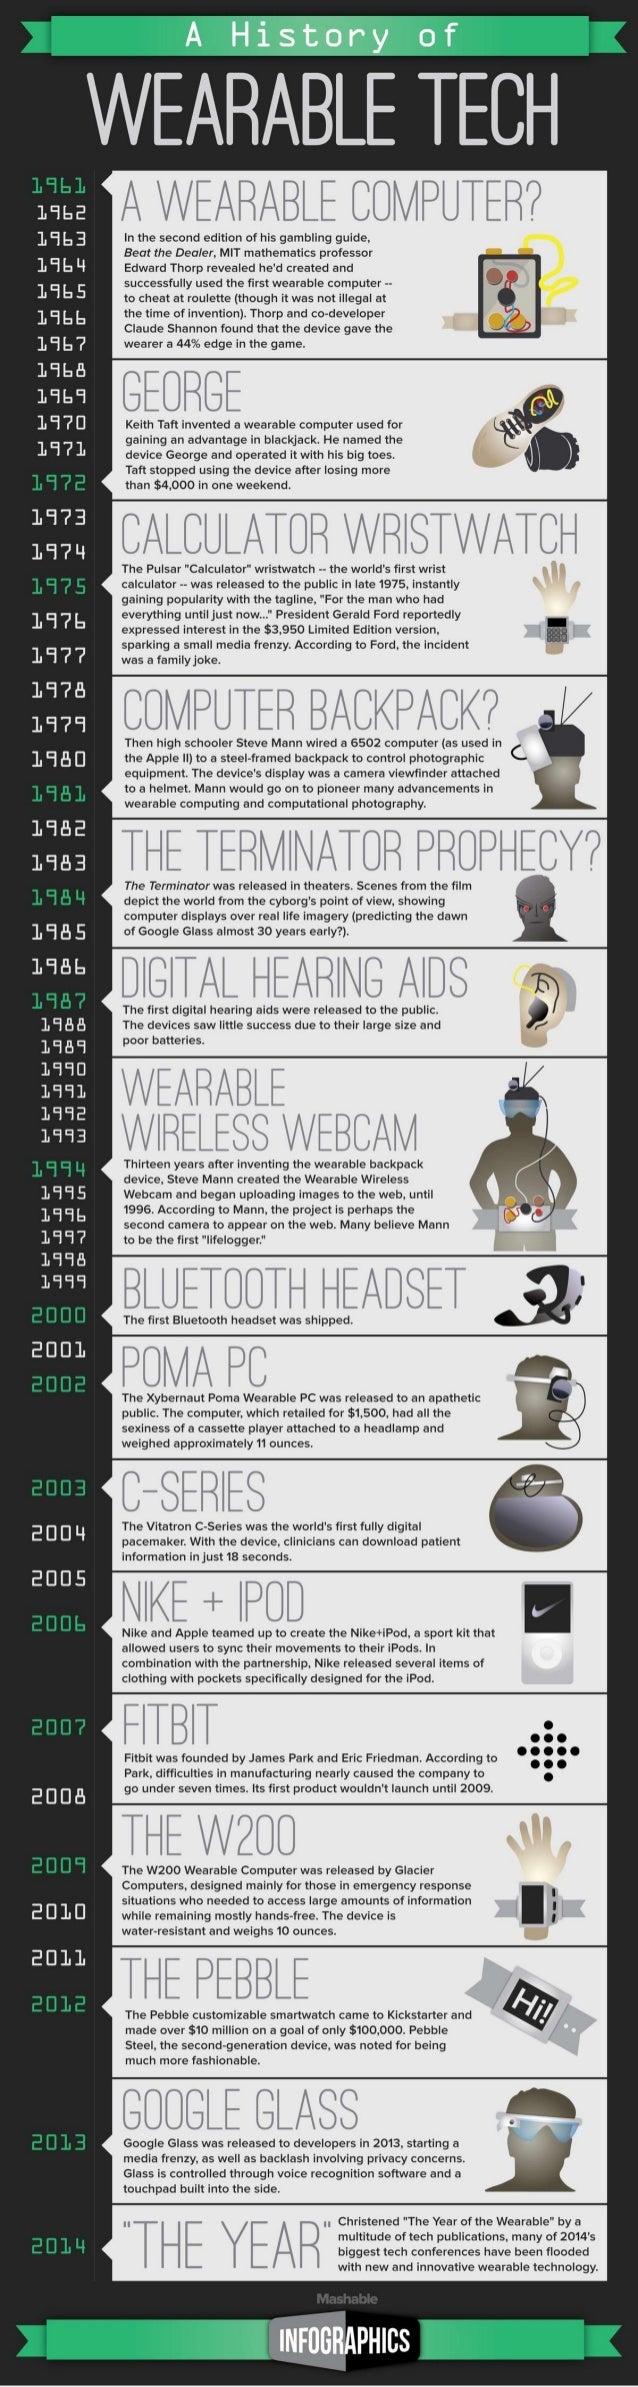 History of Wearable Tech